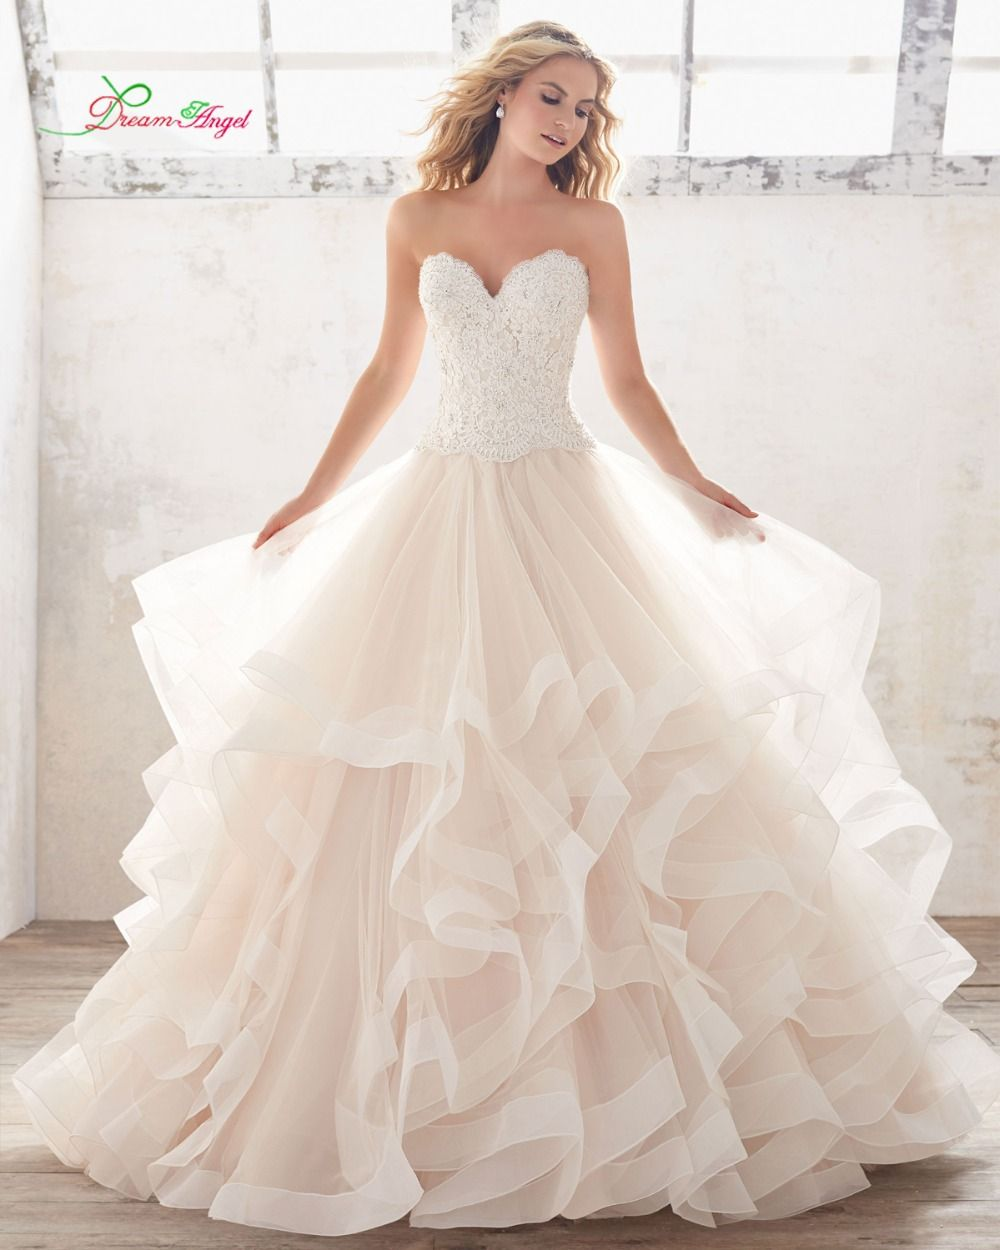 Strapless bra for wedding dress plus size  Dream Angel Vestido De Noiva Sweetheart Ruffles Wedding Dress